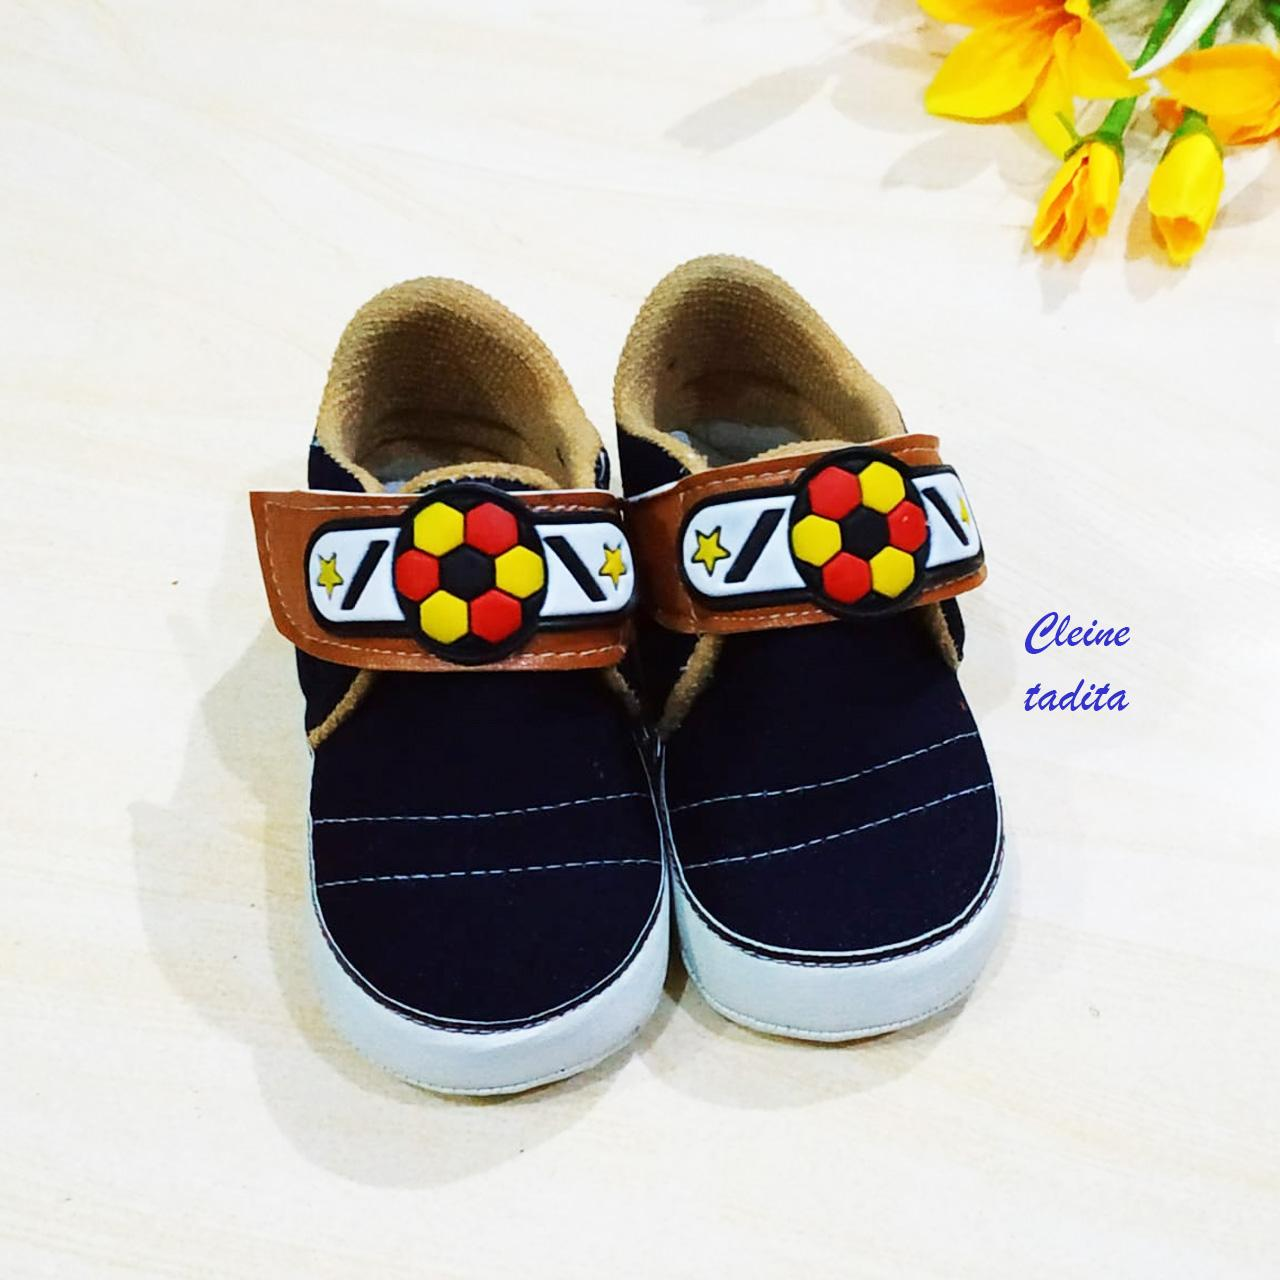 cleine tadita – sepatu santai baby shoes sepatu bayi laki-laki allsize 0-10 bulan kombinasi dikirim random